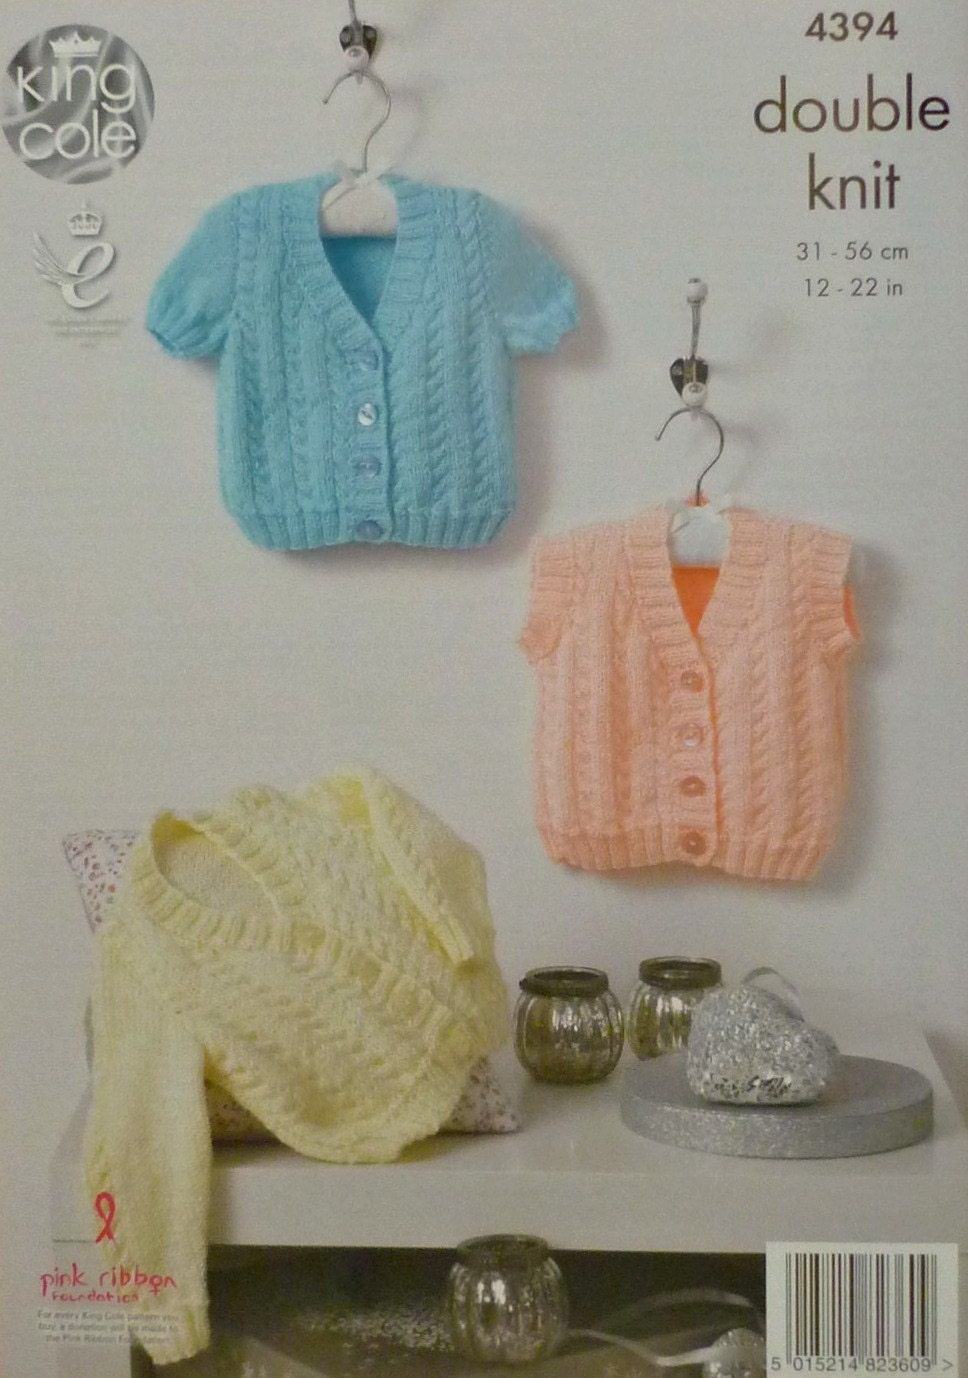 Baby Knitting Pattern K4394 Babies Short Sleeve V-Neck Cable Cardigan Knittin...